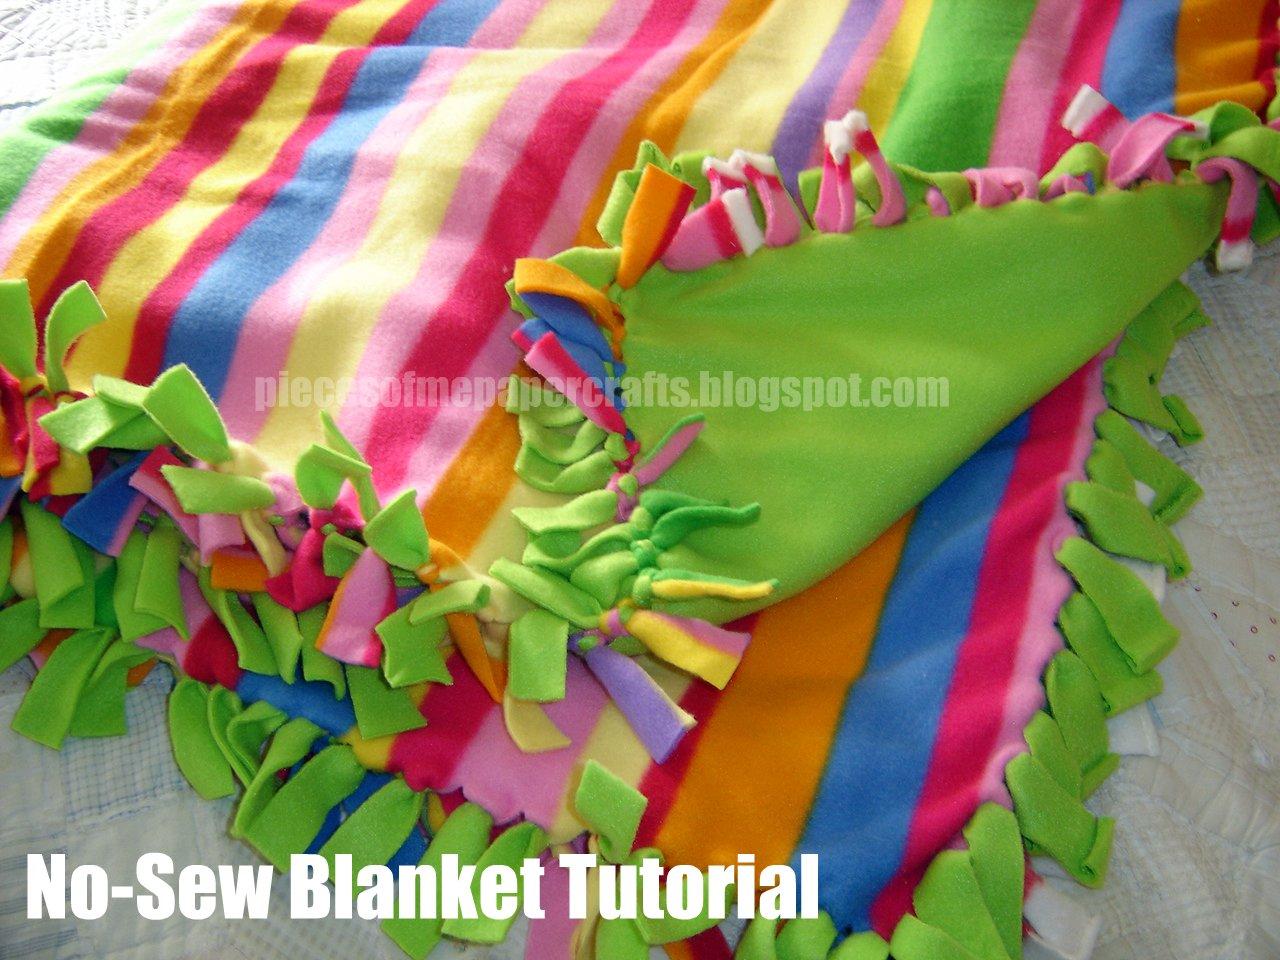 pieces of me scrapbooking paper crafts no sew blanket tutorial